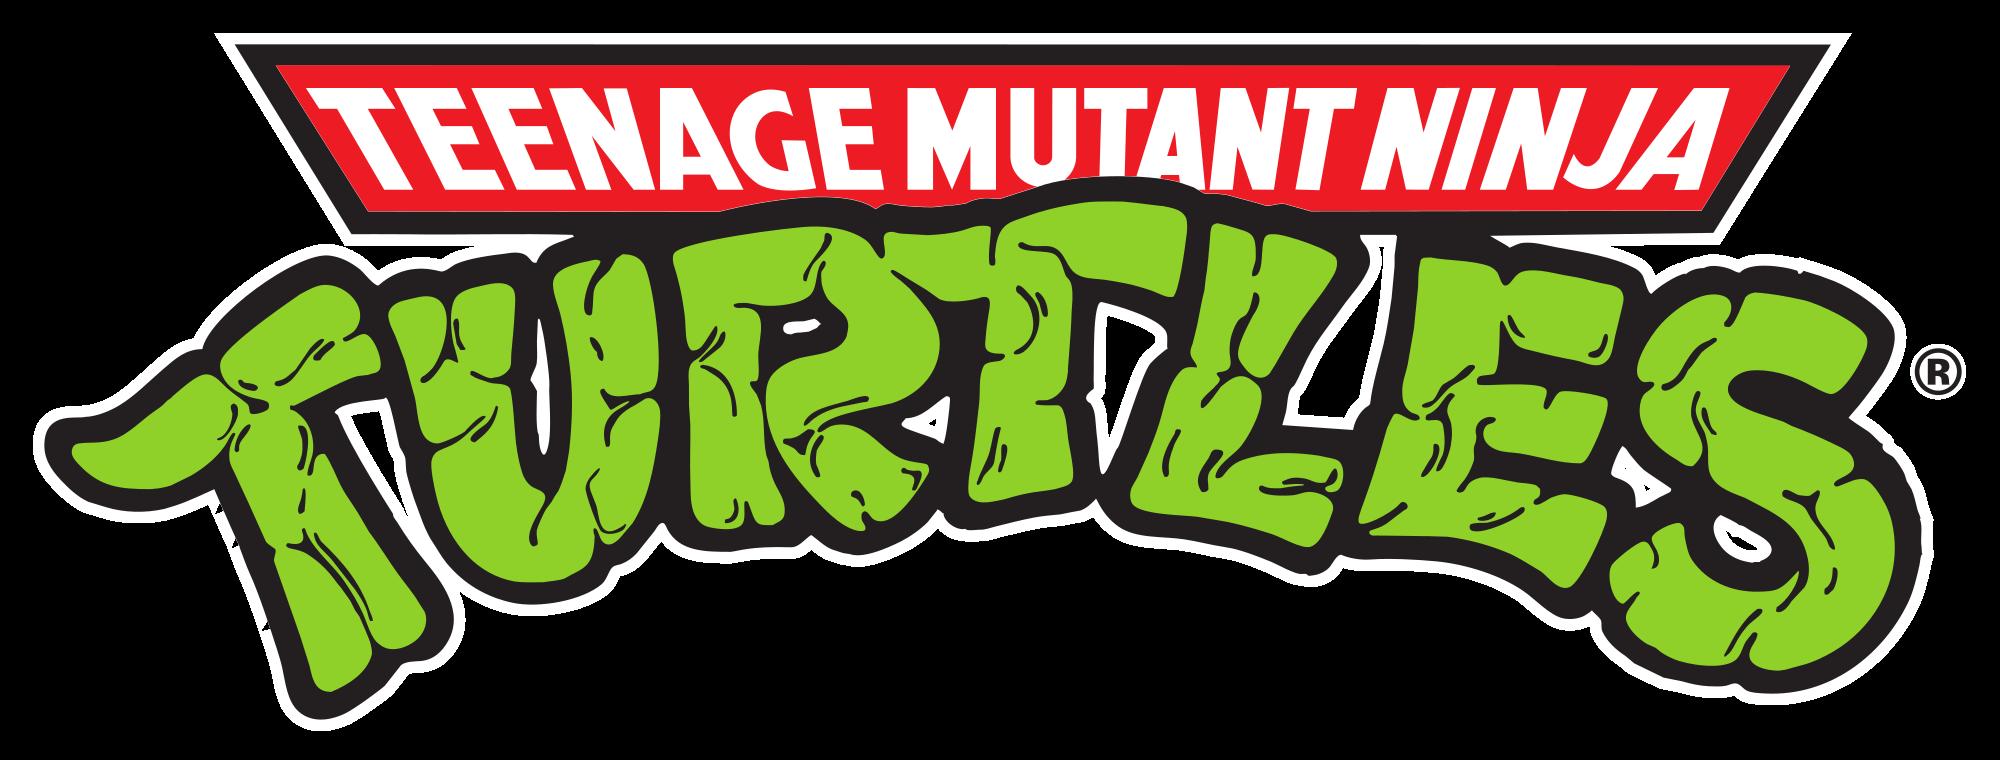 2000x760 Logo Clipart Ninja Turtle